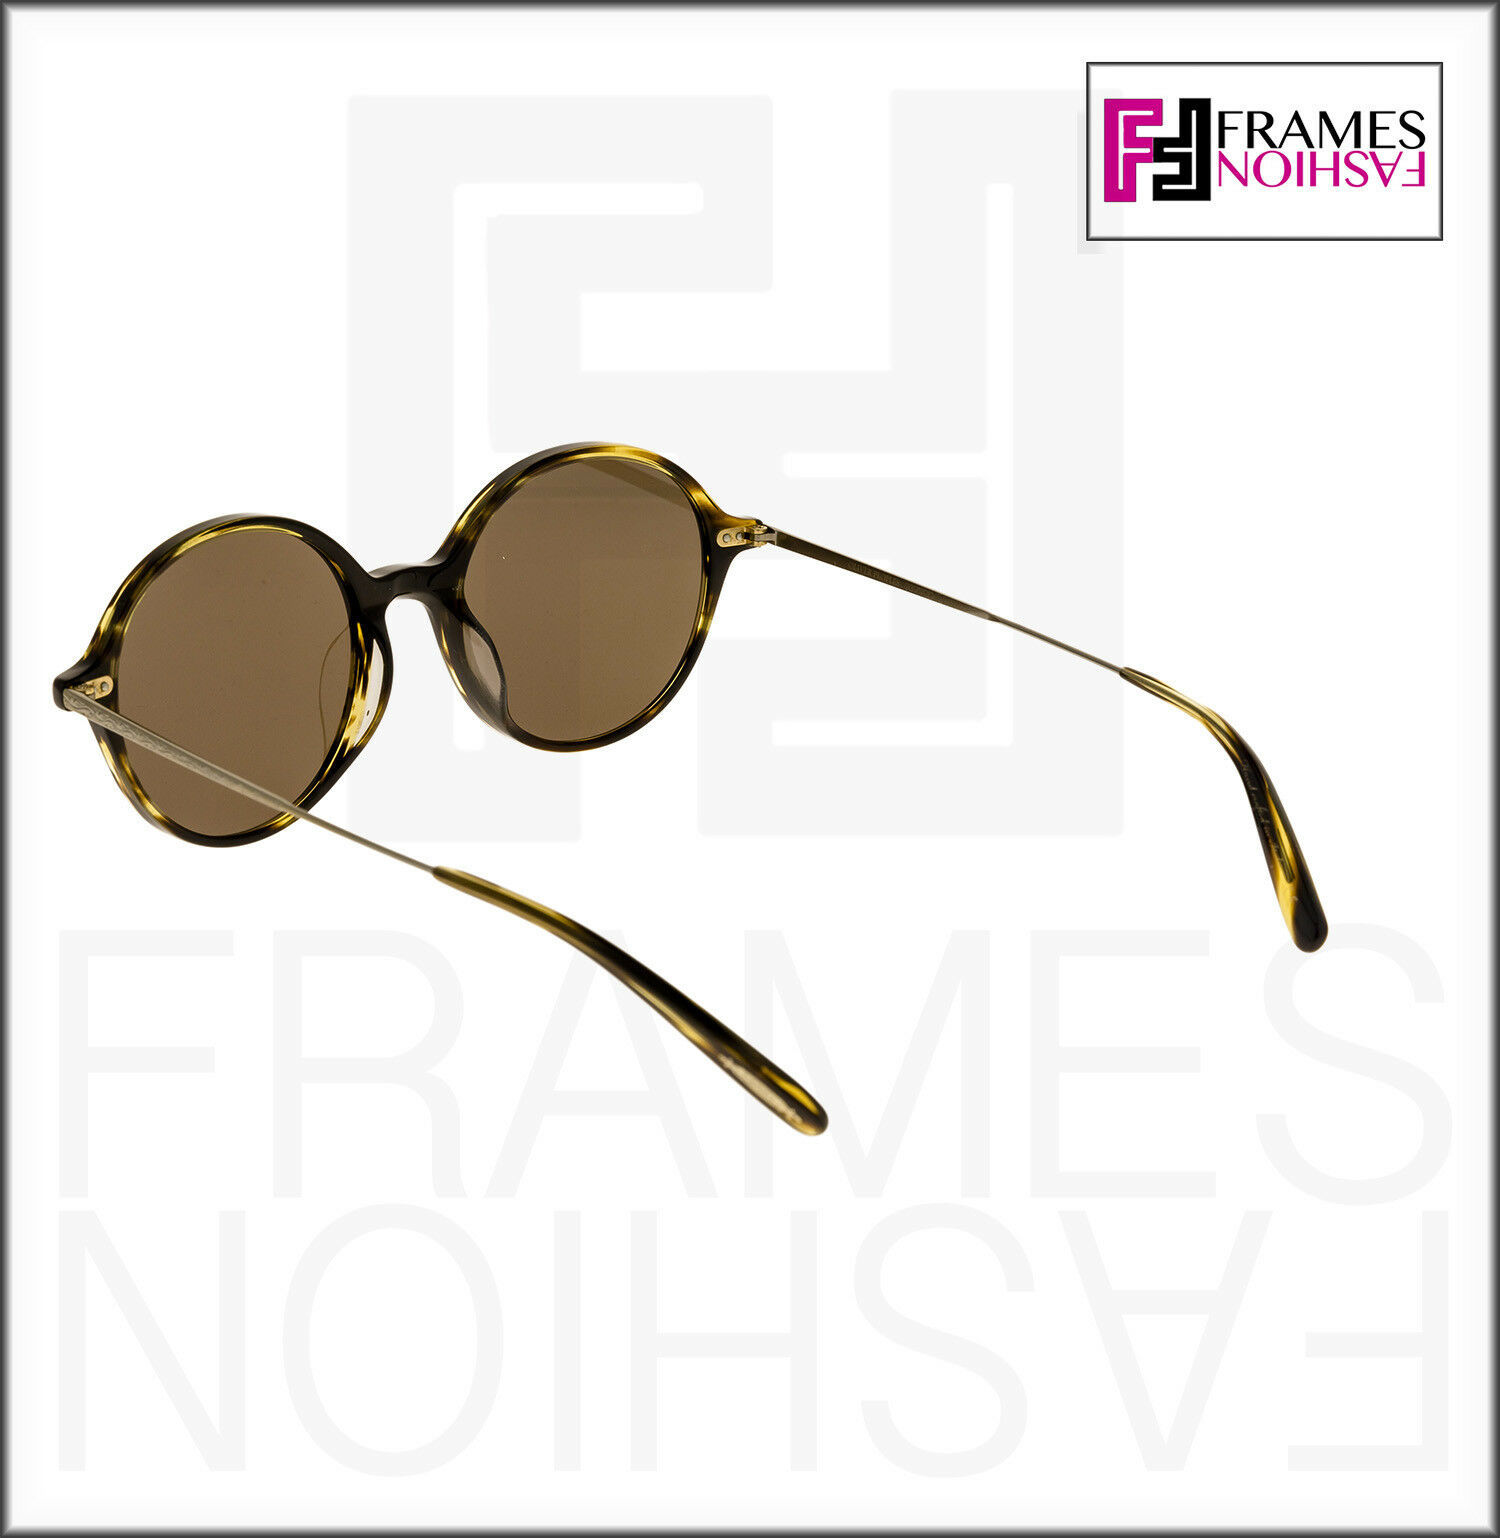 OLIVER PEOPLES CORBY OV5347SU Cocobolo Brown Gold Round Sunglasses 5347 Unisex image 3